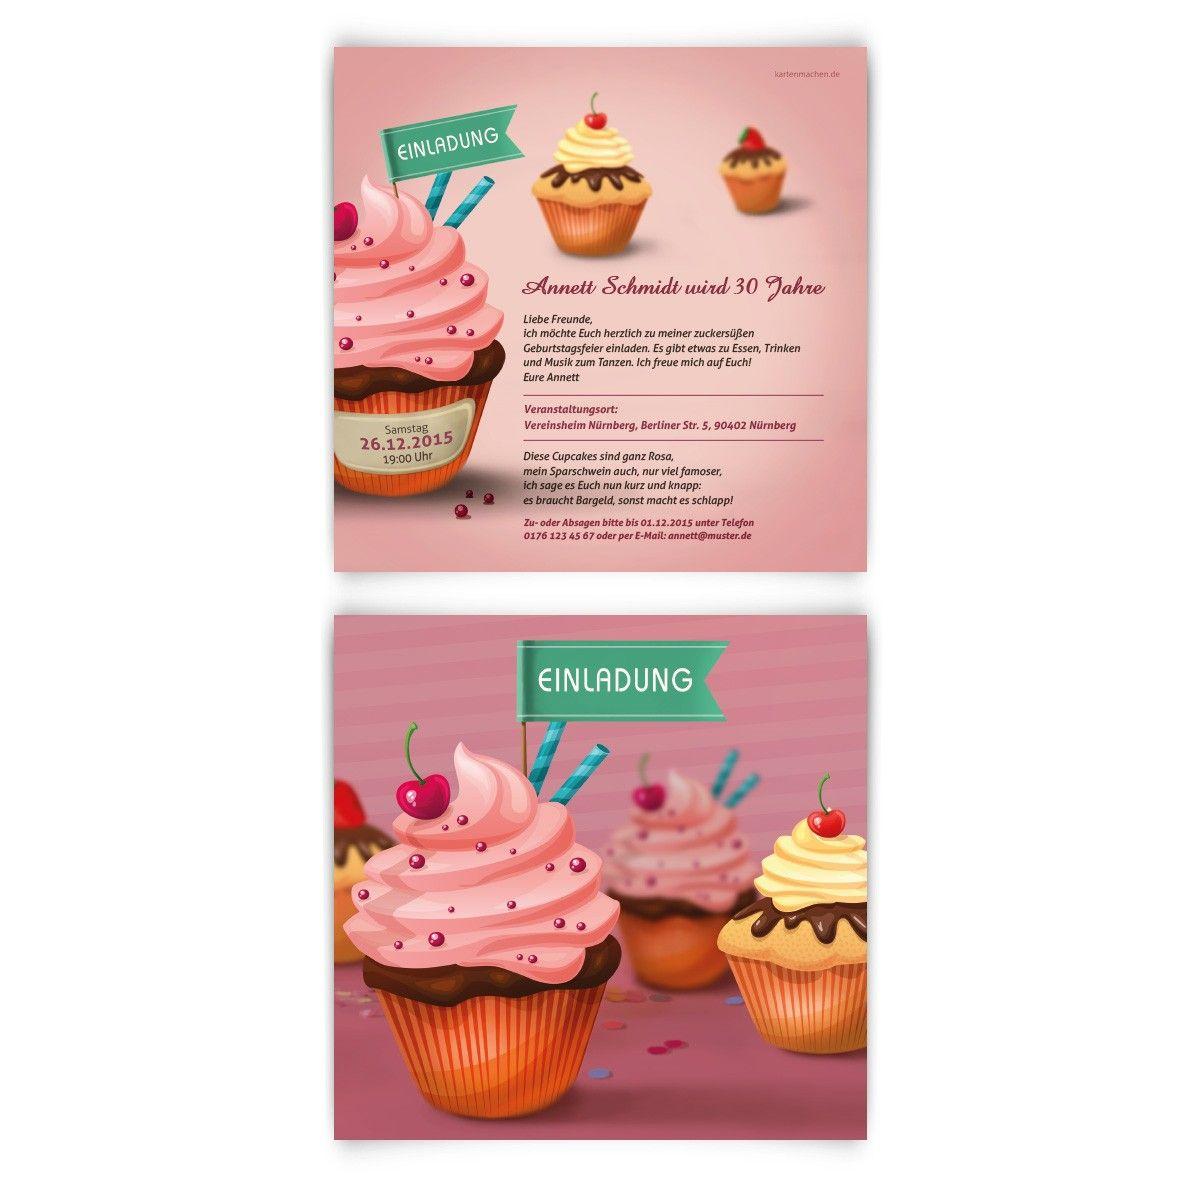 geburtstagseinladungen cupcake geburtstag einladung geburtstagseinladung cupcake birthday. Black Bedroom Furniture Sets. Home Design Ideas